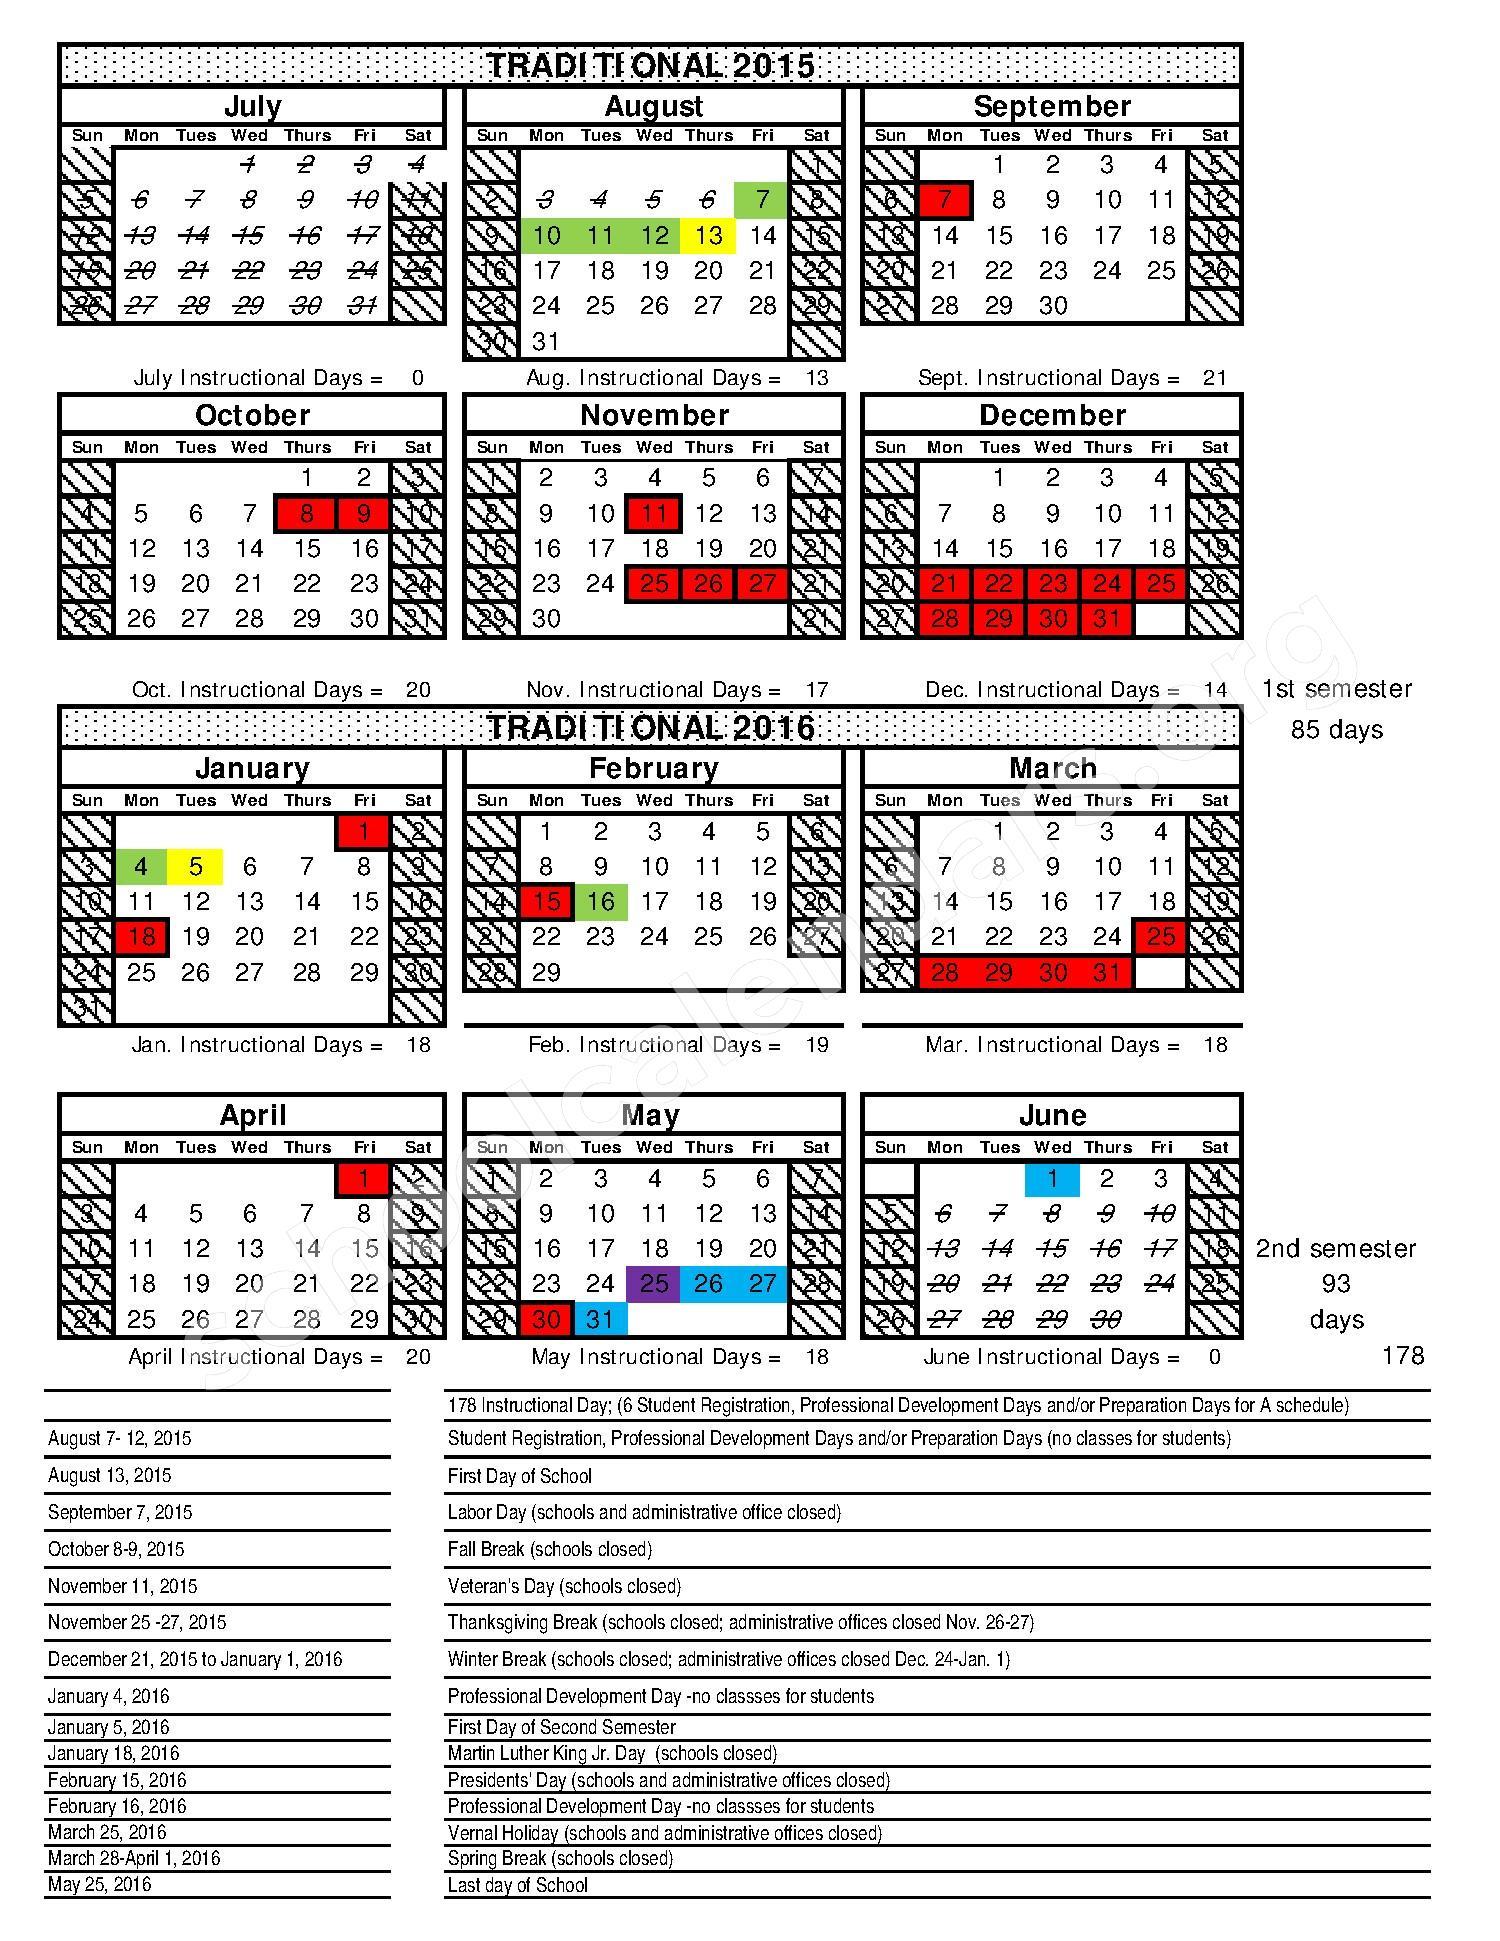 Georgia O'Keeffe Elementary School Calendars  Albuquerque, Nm in Uga School Calendar